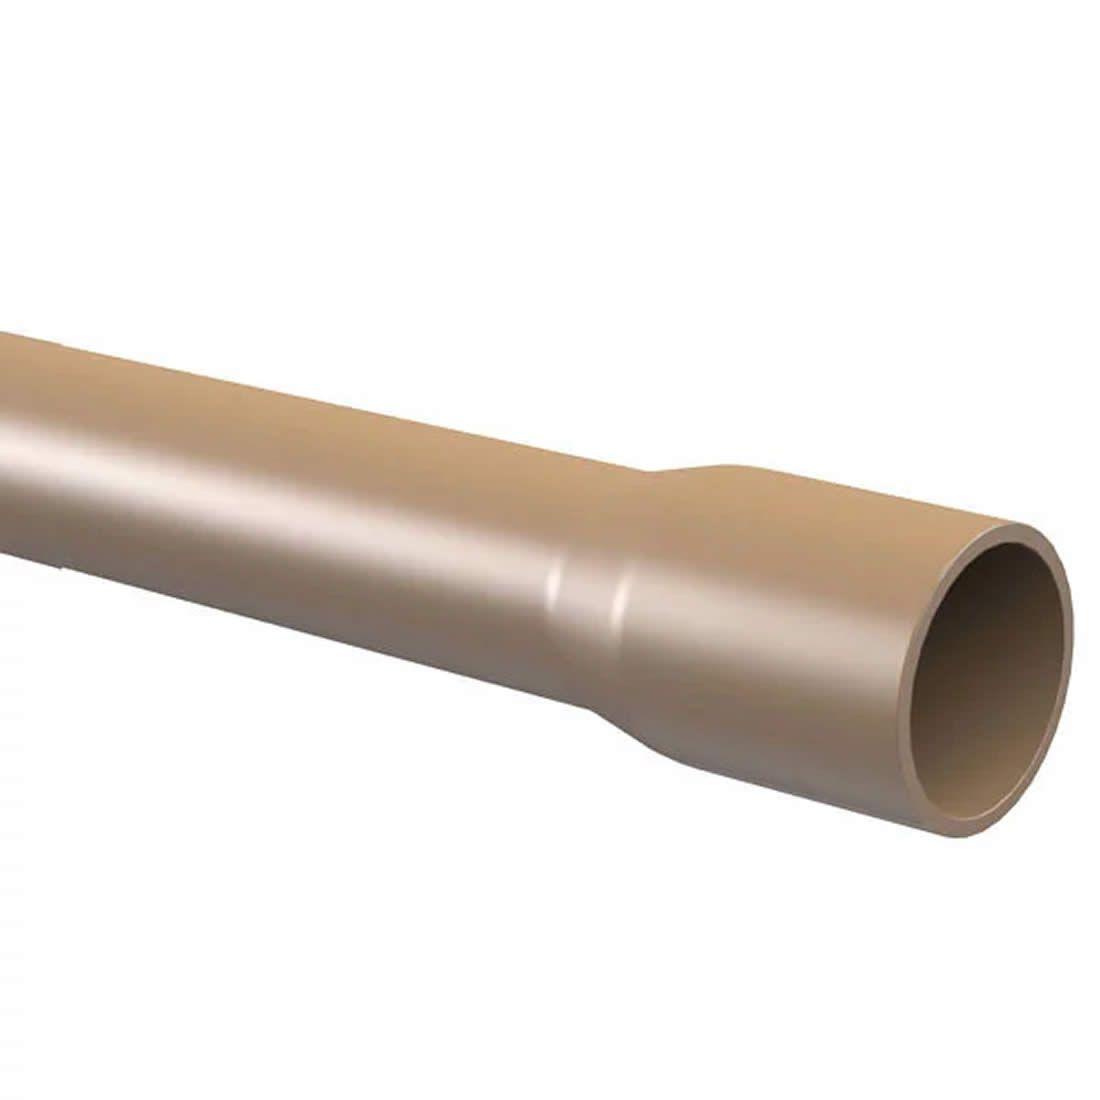 Tubo PVC Soldável 60mm X 6 Metros Tigre